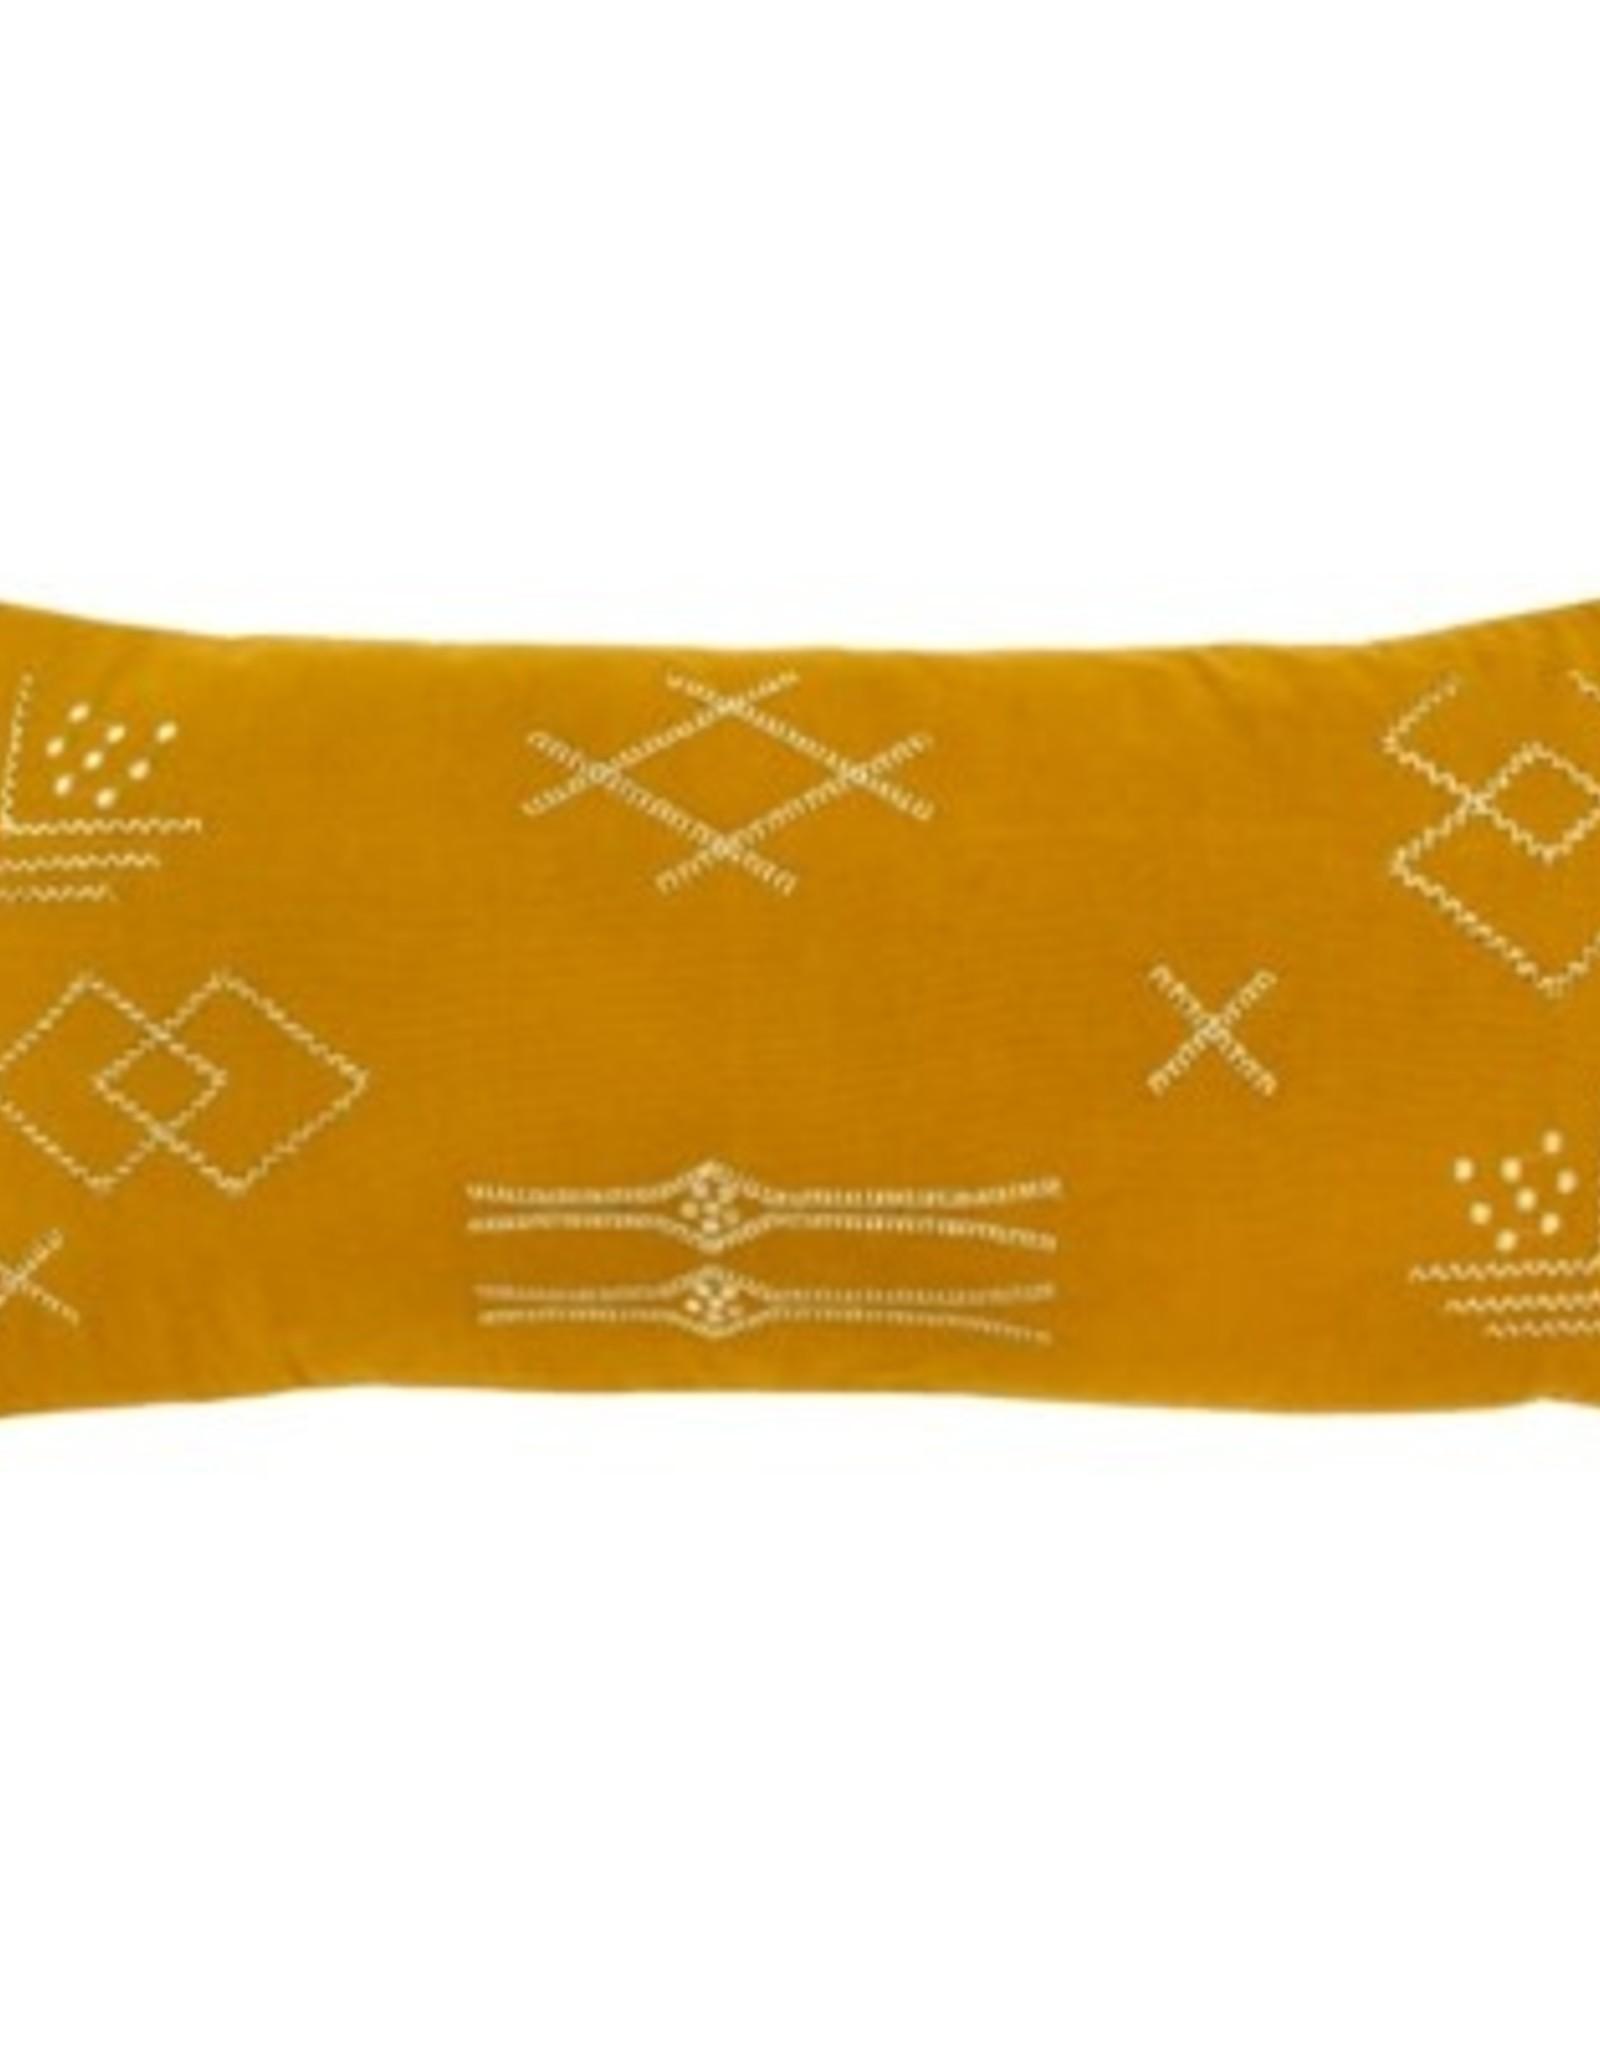 Indaba Cushions Indaba Safi Desert 15 x 32 1-5073